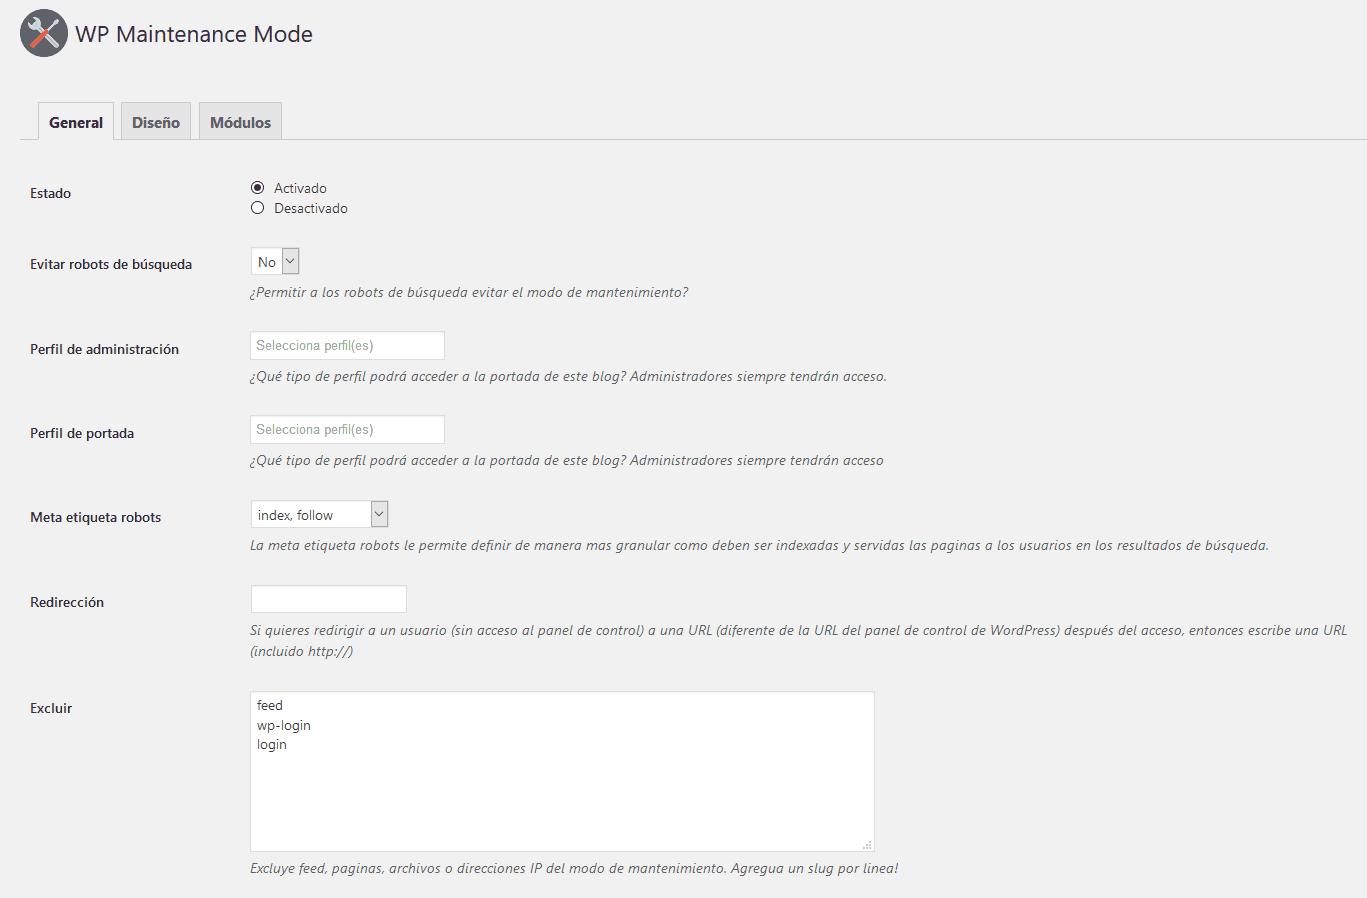 wp maintenance mode configuracion general Diseño paginas web